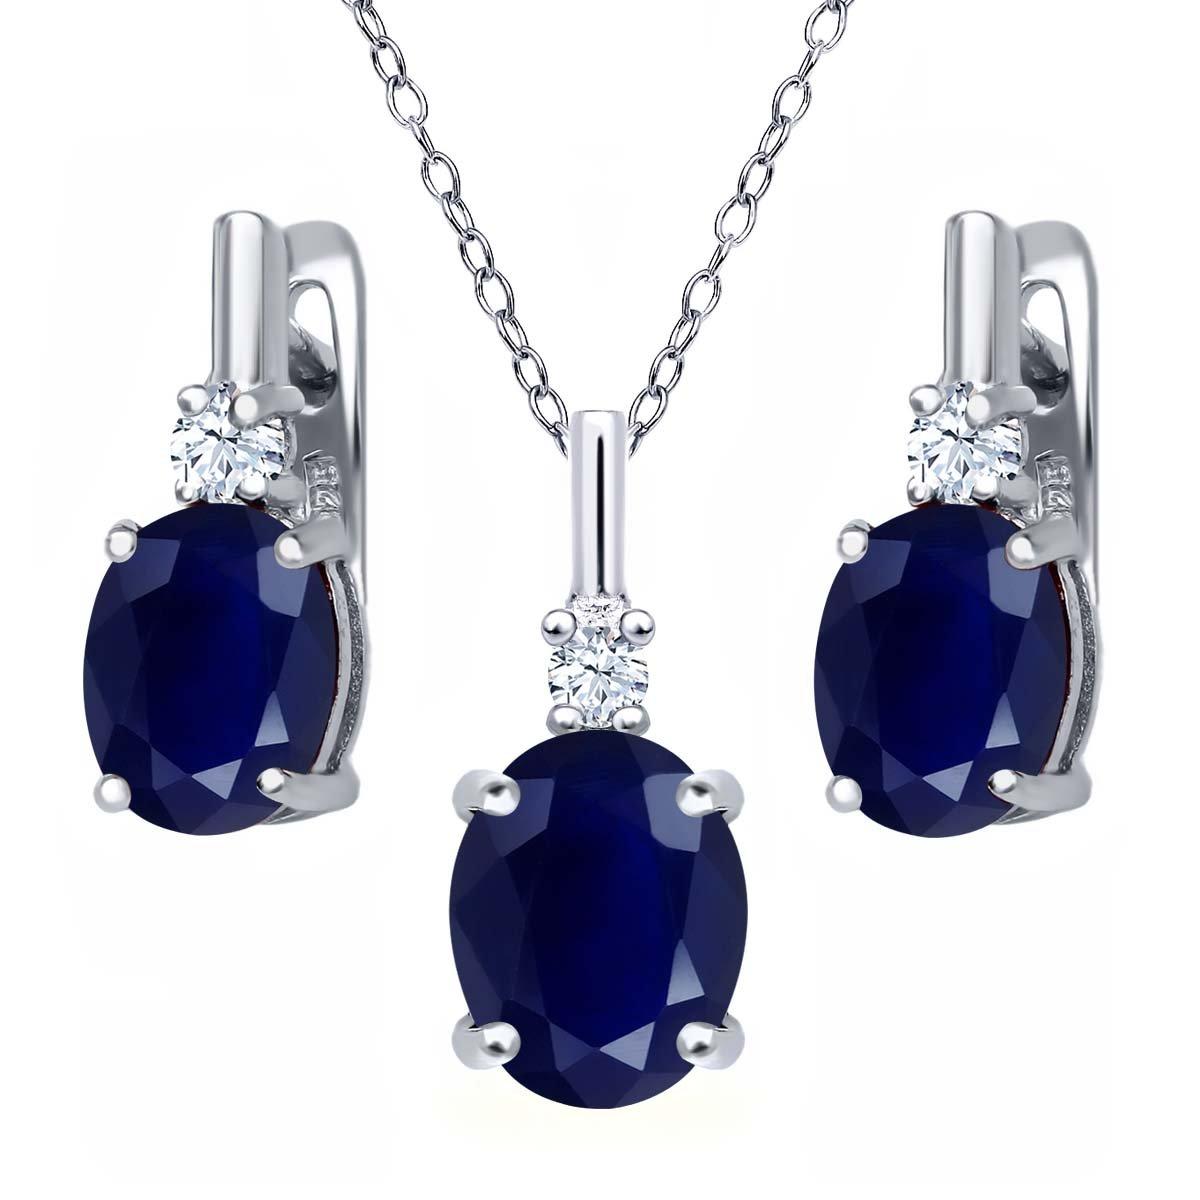 7.58 Ct Oval Blue Sapphire White Topaz 925 Sterling Silver Pendant Earrings Set